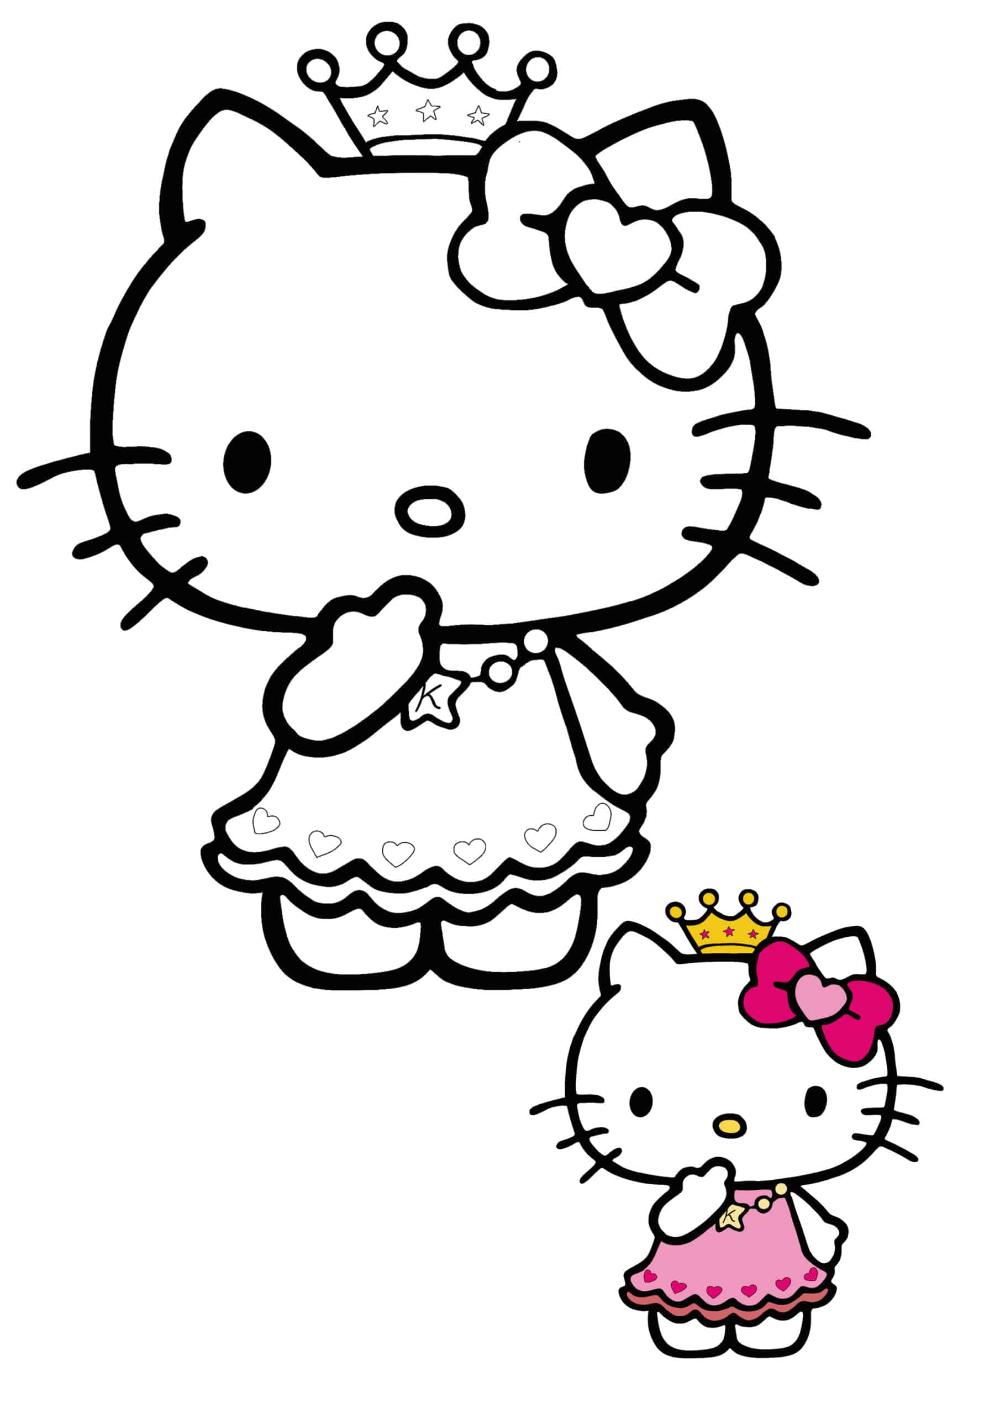 Hello Kitty Princess Coloring Pages 2 Free Coloring Sheets 2020 Princess Coloring Pages Hello Kitty Coloring Princess Kitty